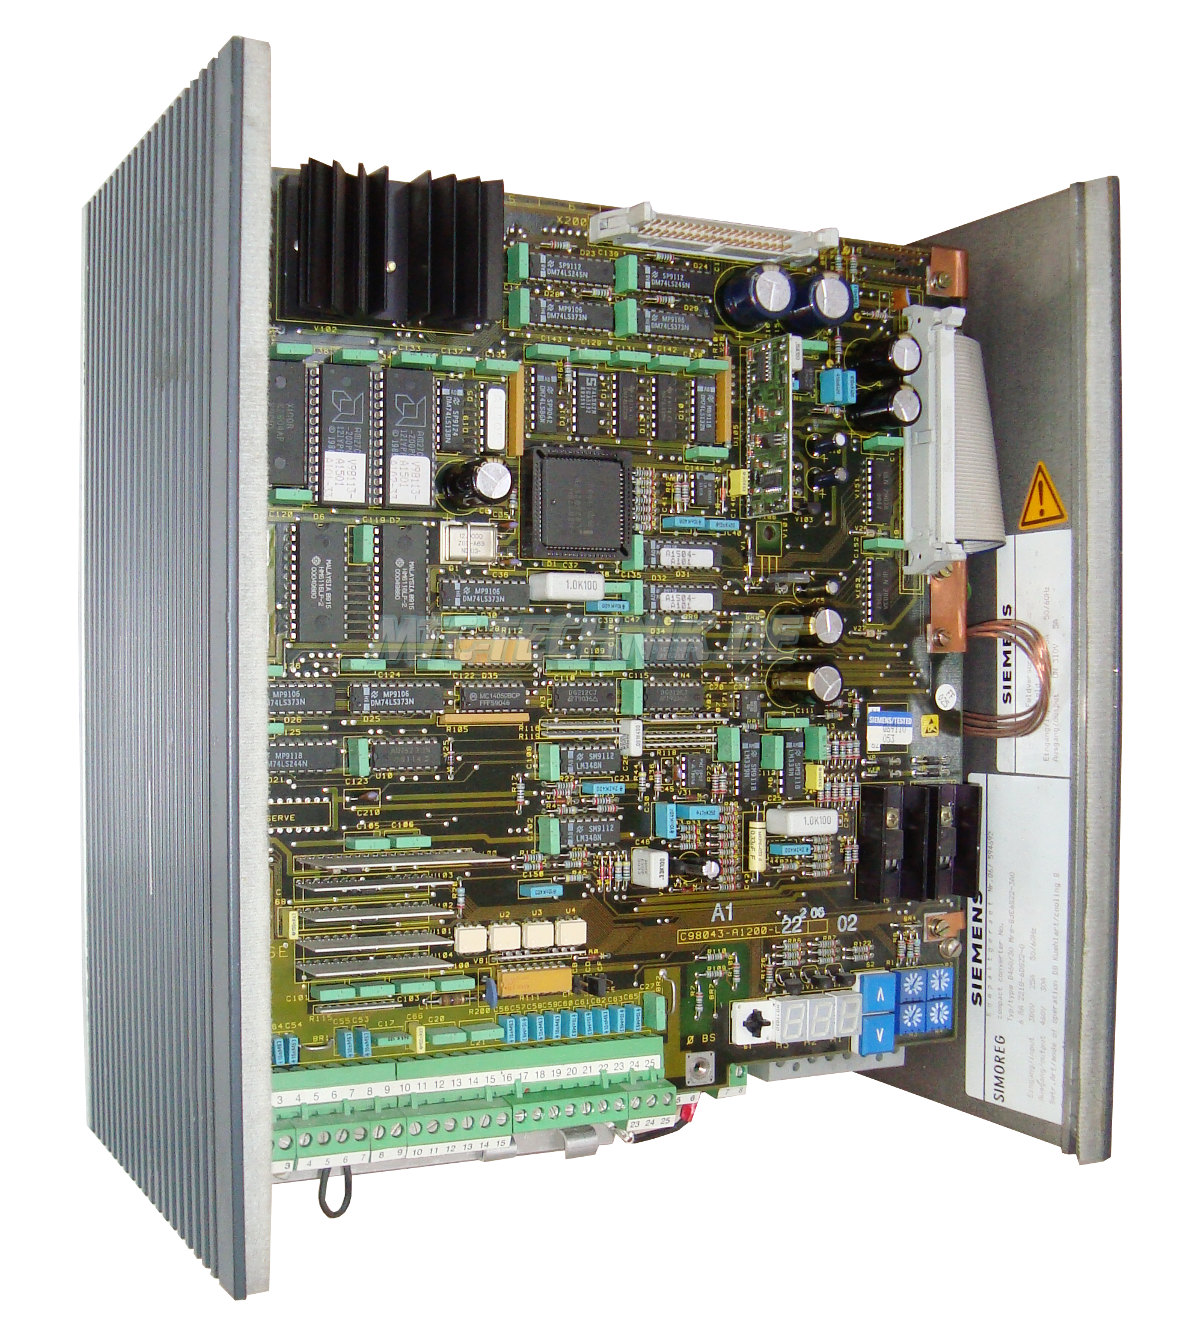 1 Siemens Shop 6ra2218-6ds22-0 Simoreg Gleichstromantrieb